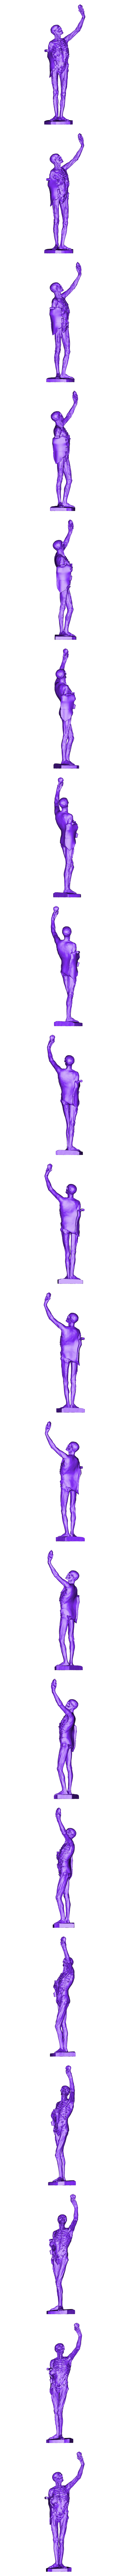 Le_Transi_De_Rene_De_Chalon.obj Download free OBJ file The Transi of Rene of Chalon • 3D printer template, ThreeDScans